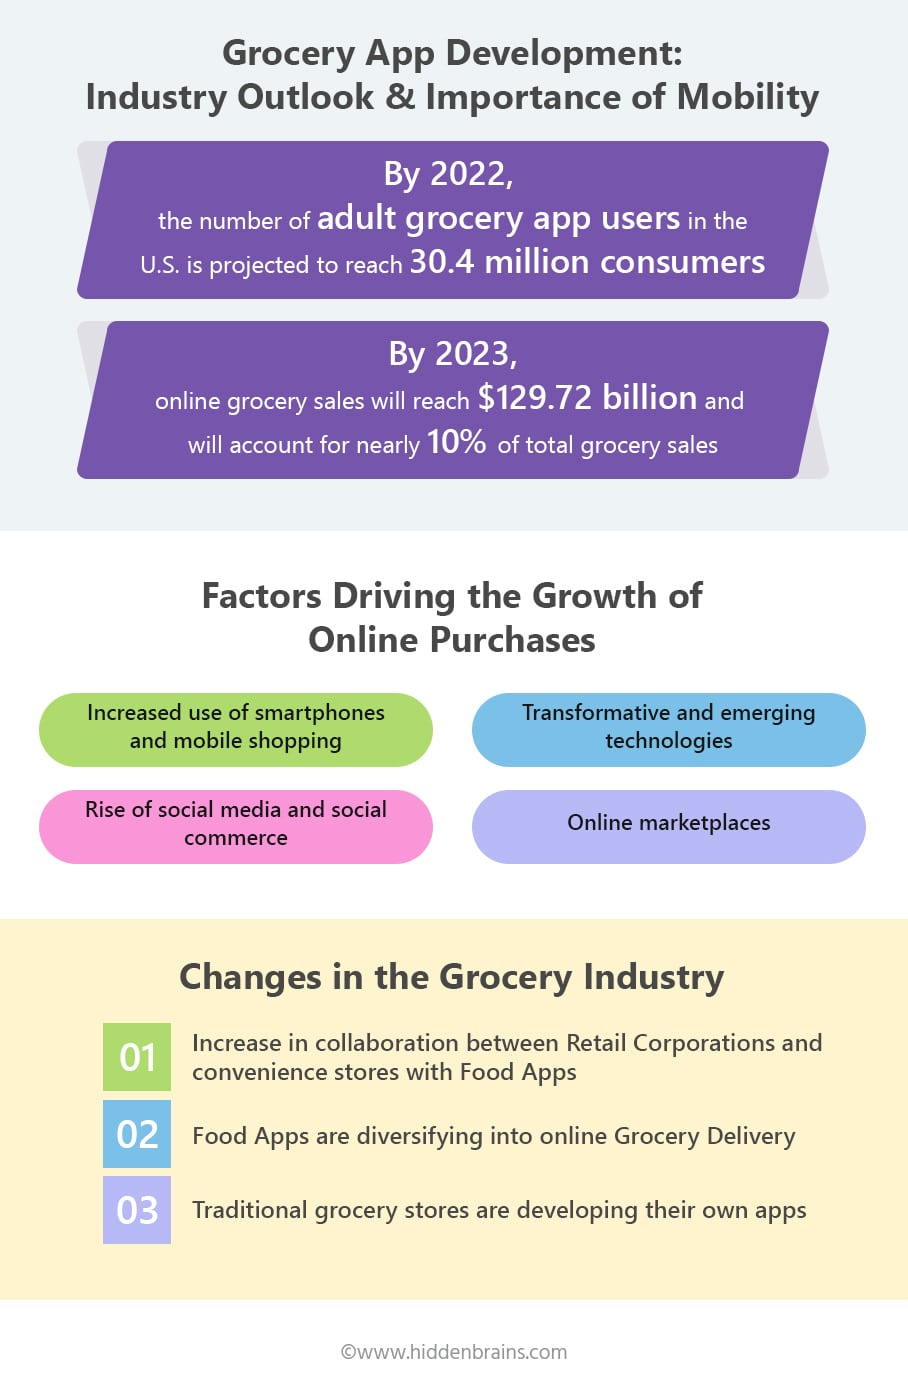 Grocery App Development Trends